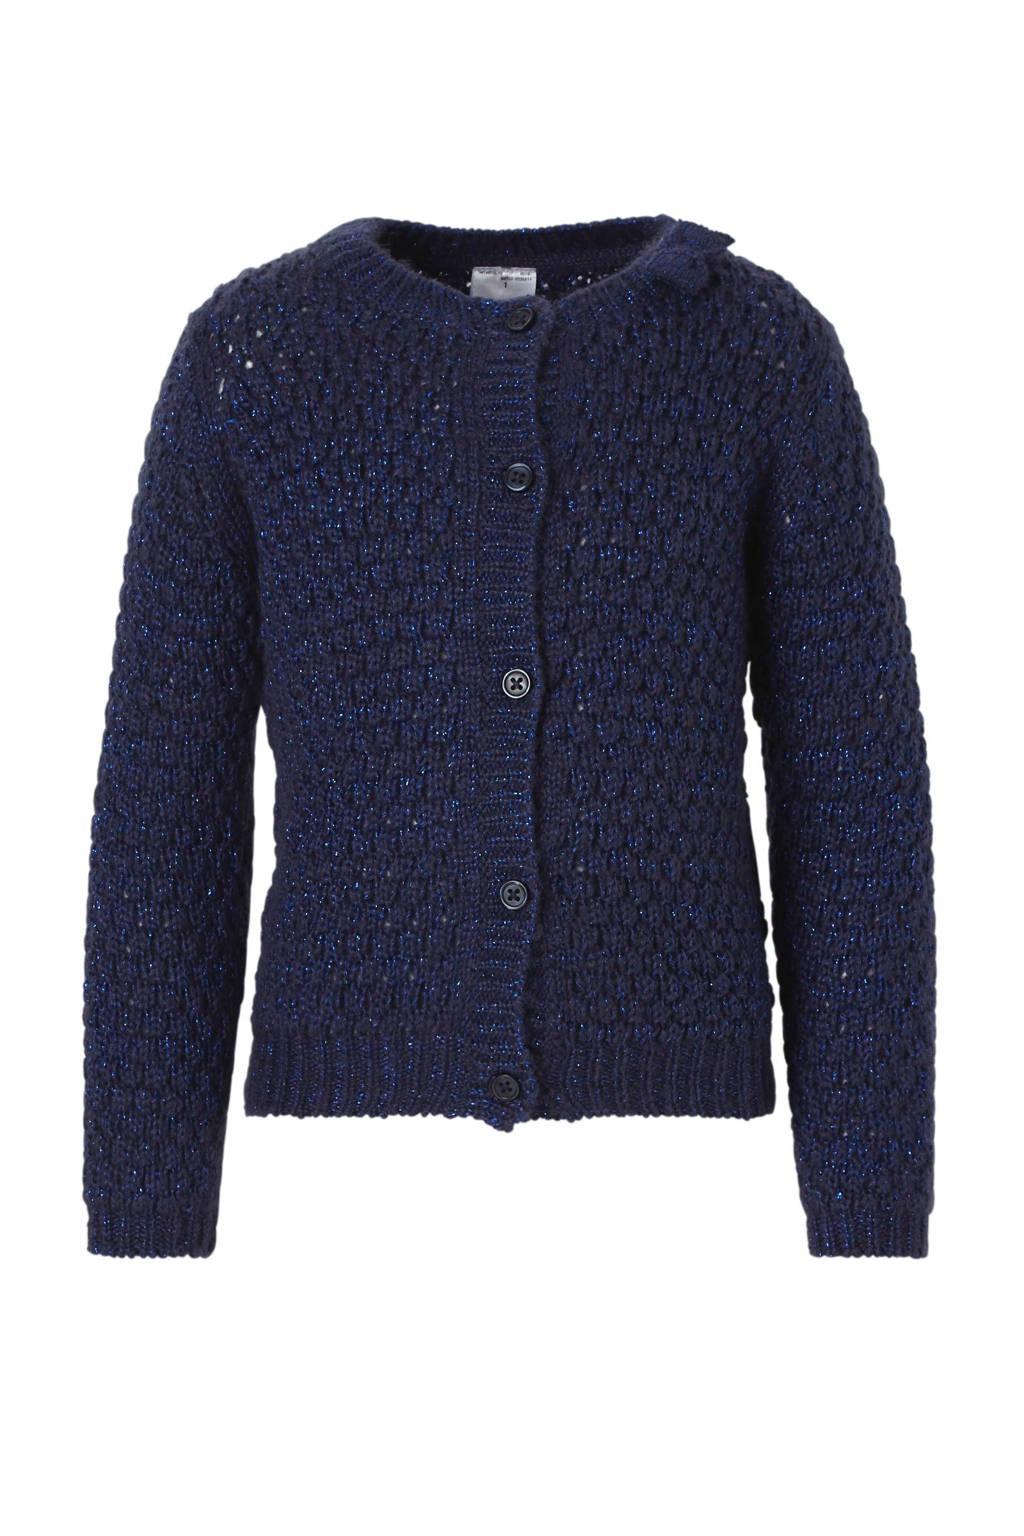 C&A Palomino vest met glitters blauw, Blauw